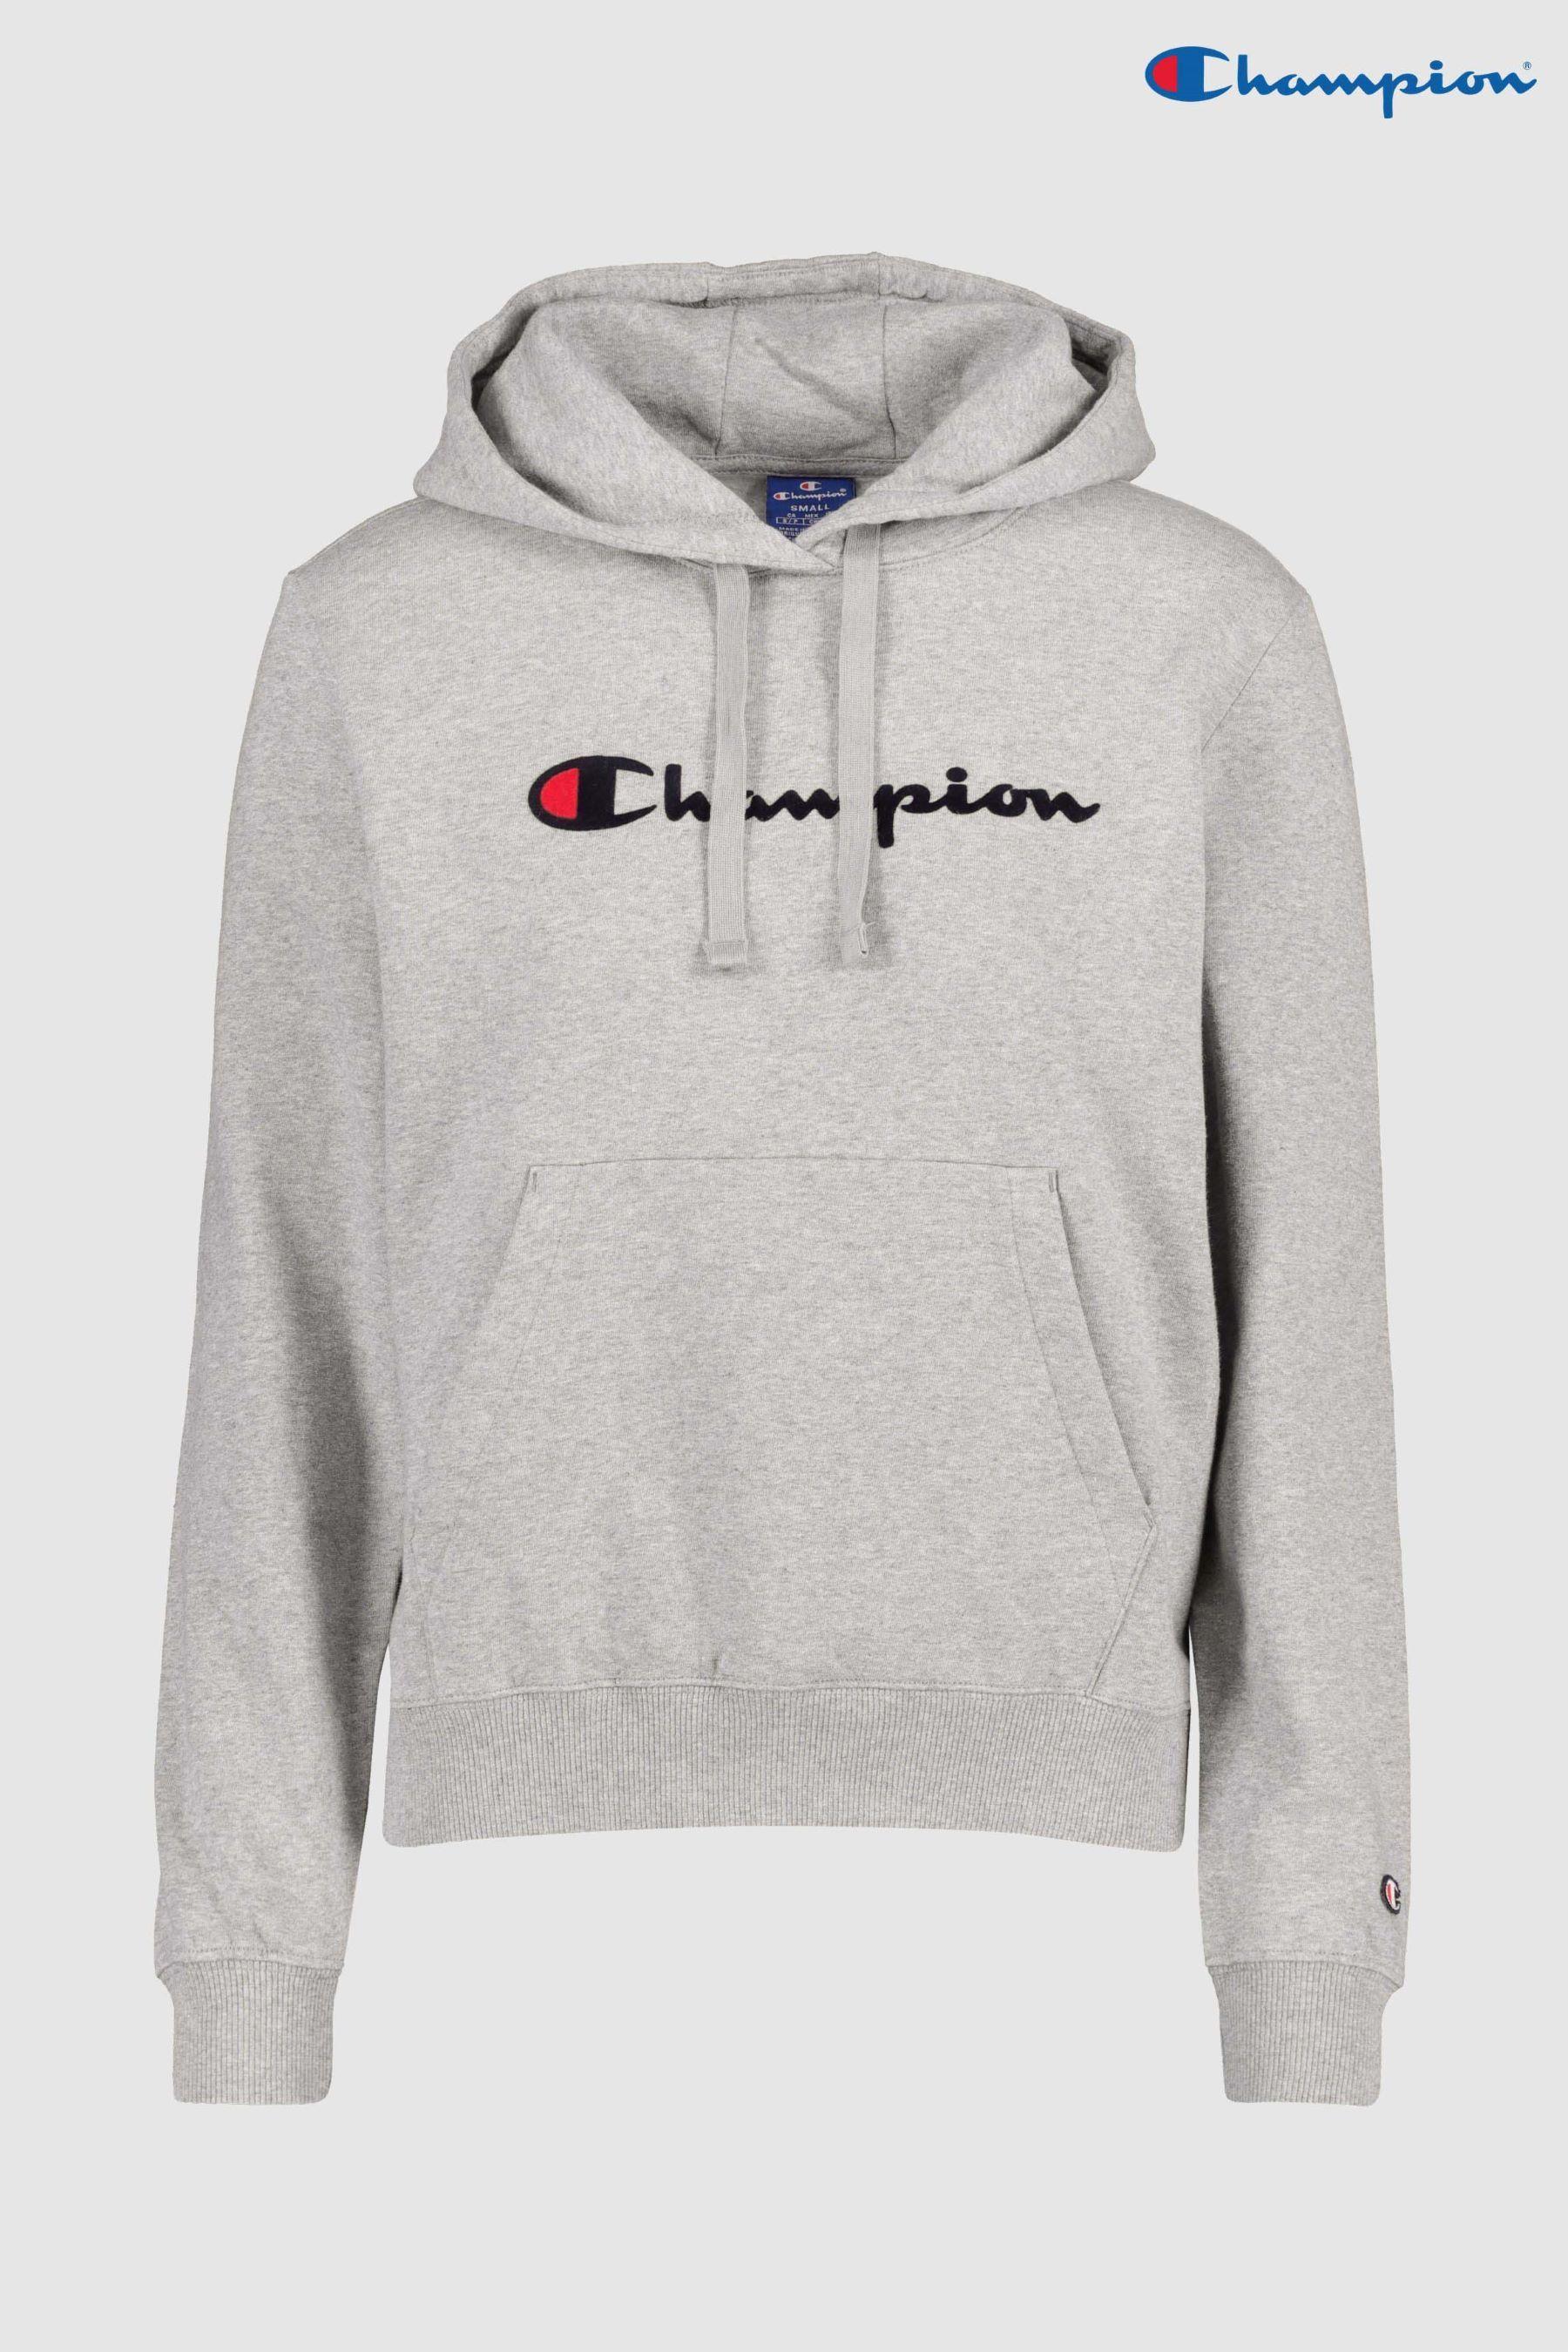 8773590a799 Womens Champion Logo Hoody - Red | Champion Clothing Brand ...